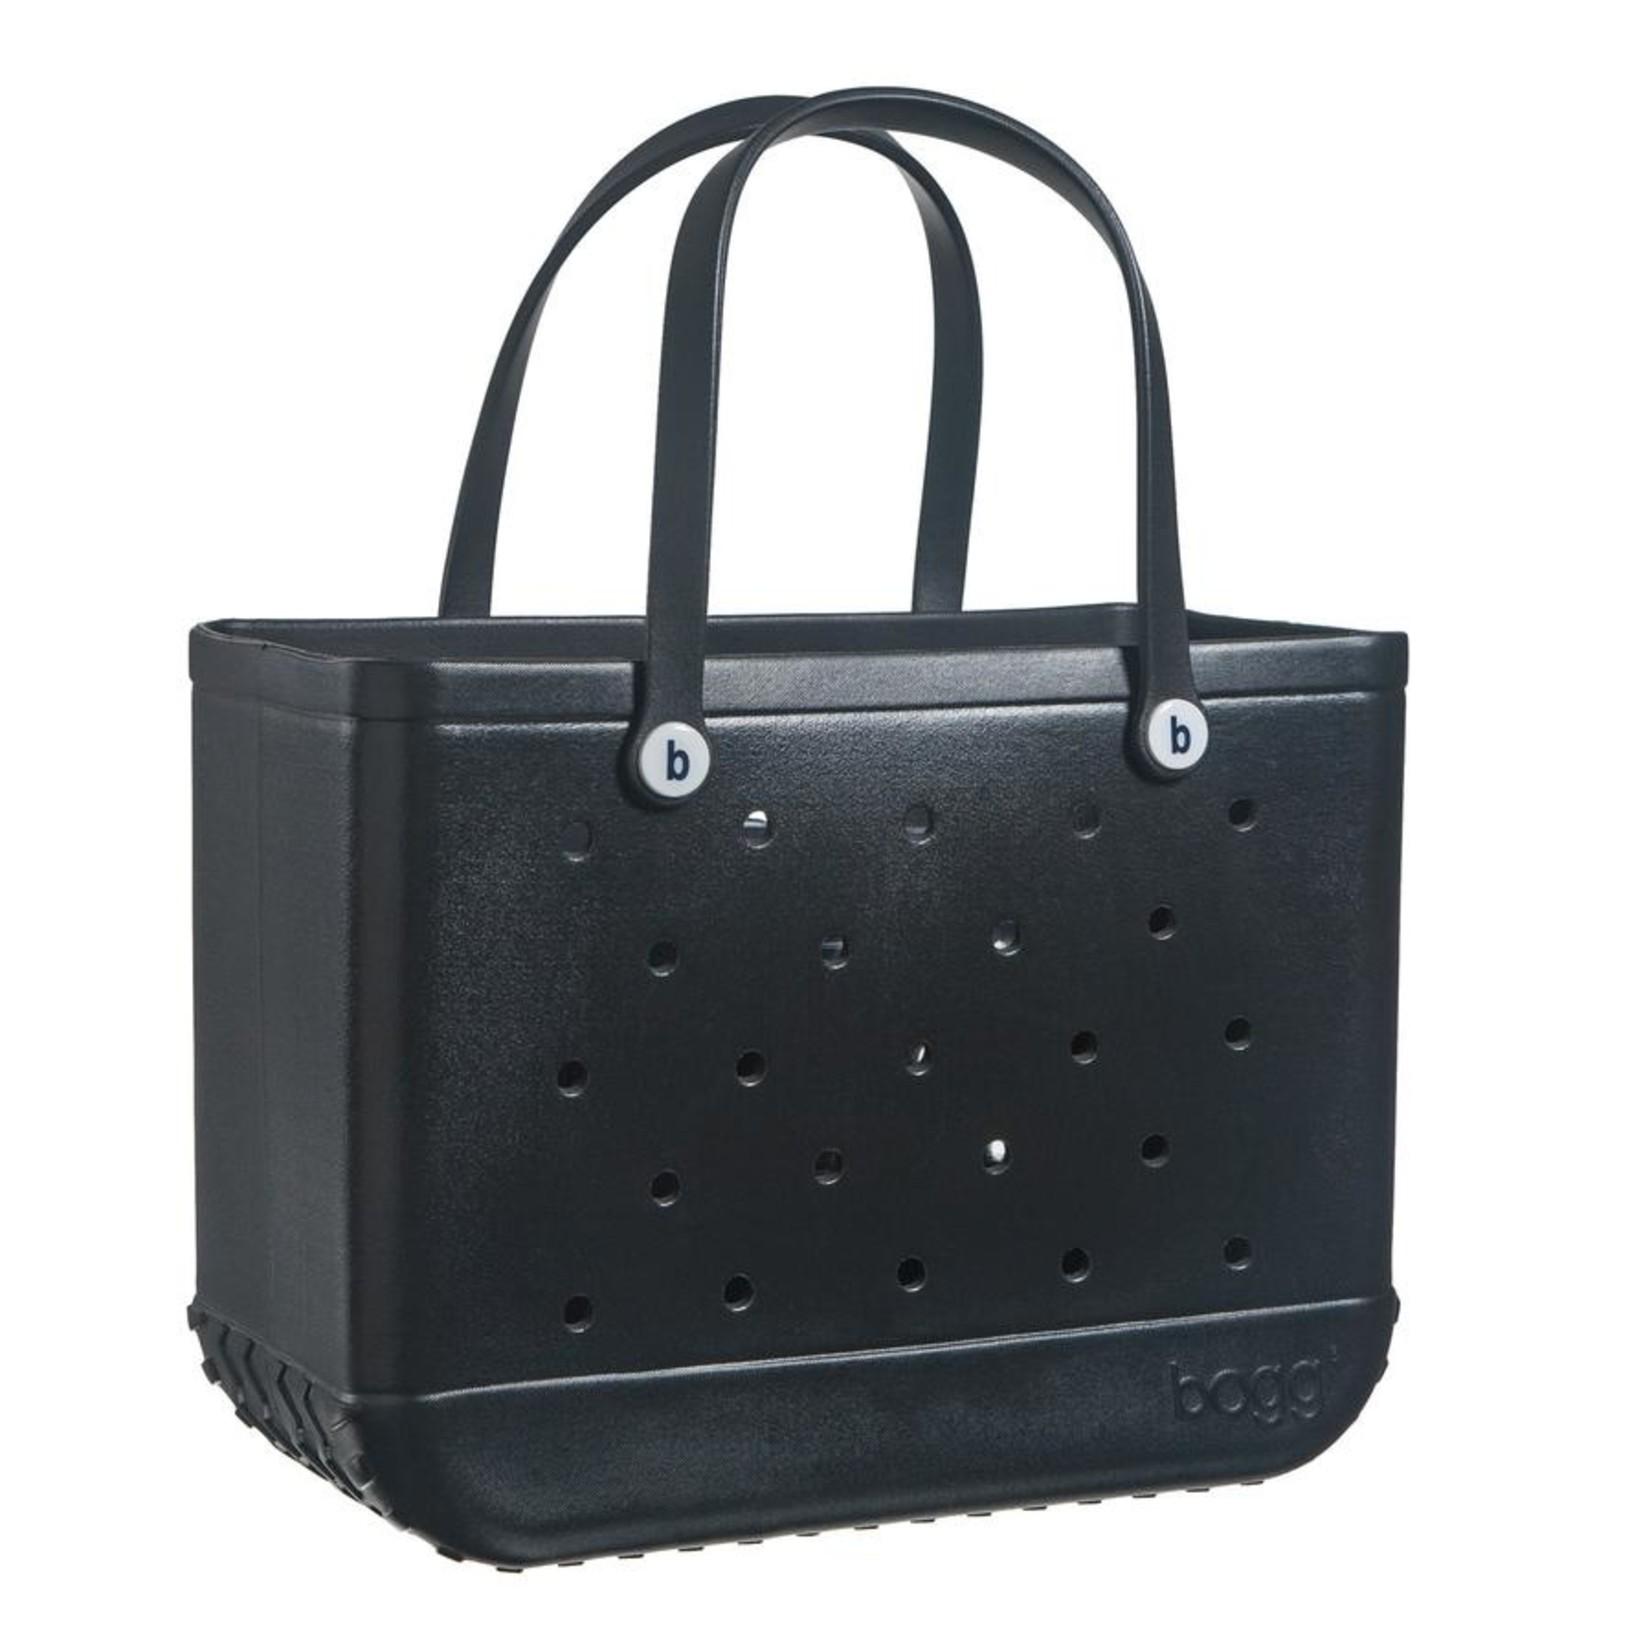 Bogg Bags lbd BLACK Original Bogg